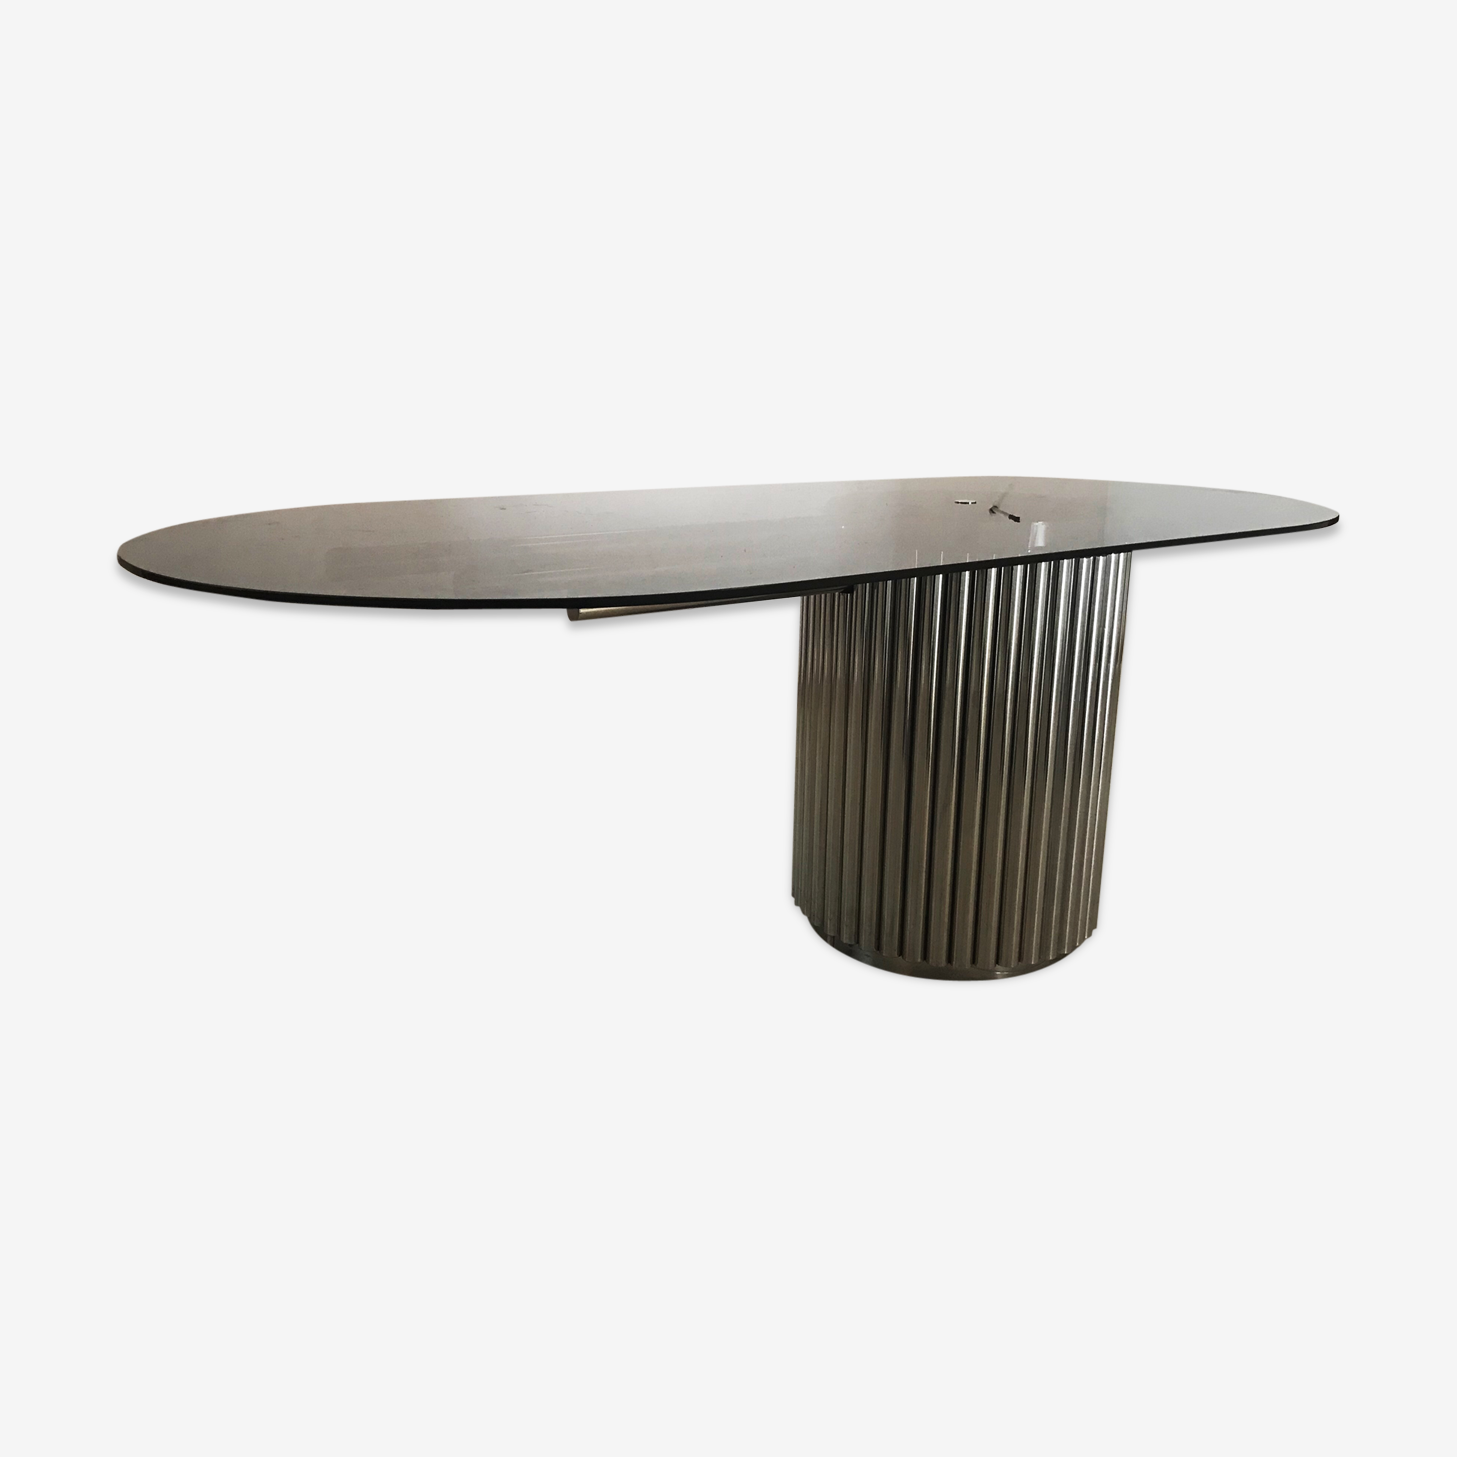 Table métal et verre Gastone Rinaldi 1970